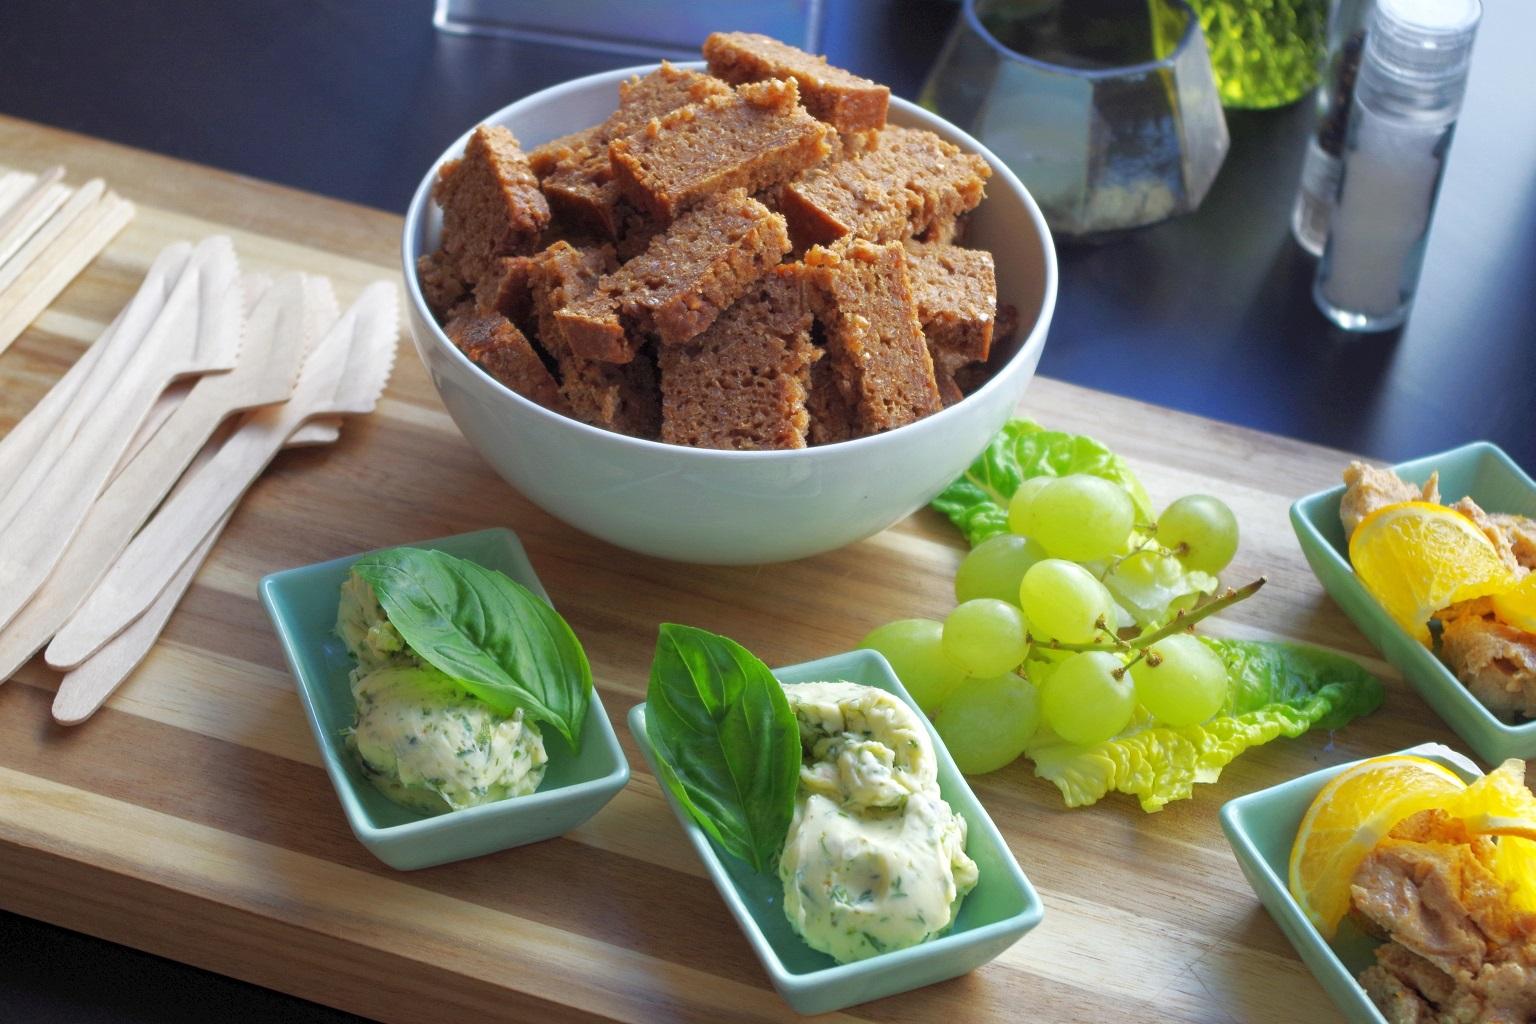 Eat The World Kulinarische Touren Zum Sonderpreis Als Geschenkidee